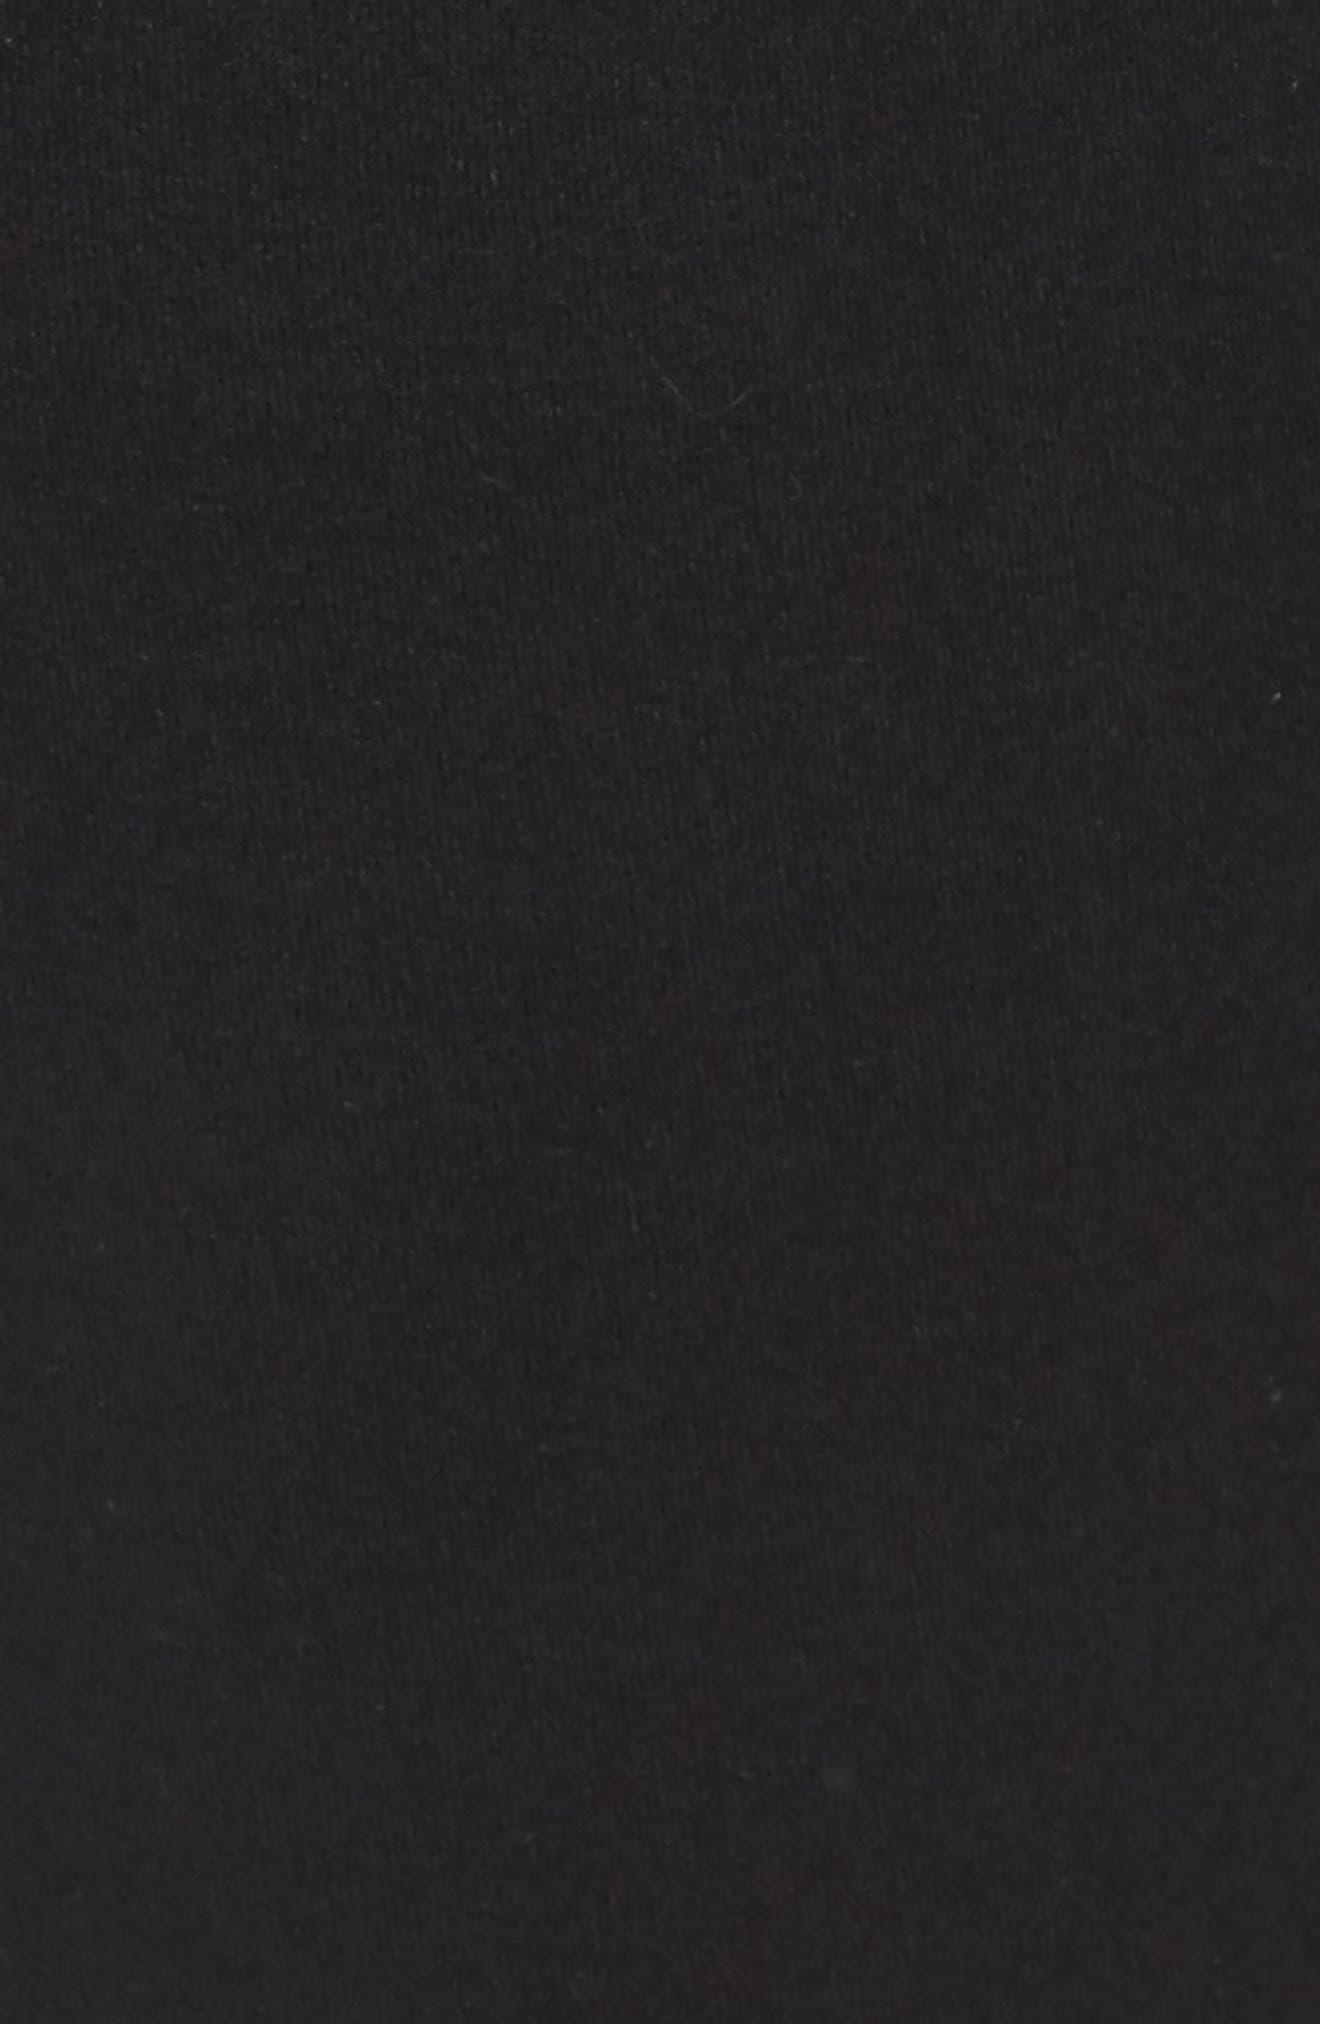 ALO, Urban Moto Sweatpants, Alternate thumbnail 6, color, BLACK